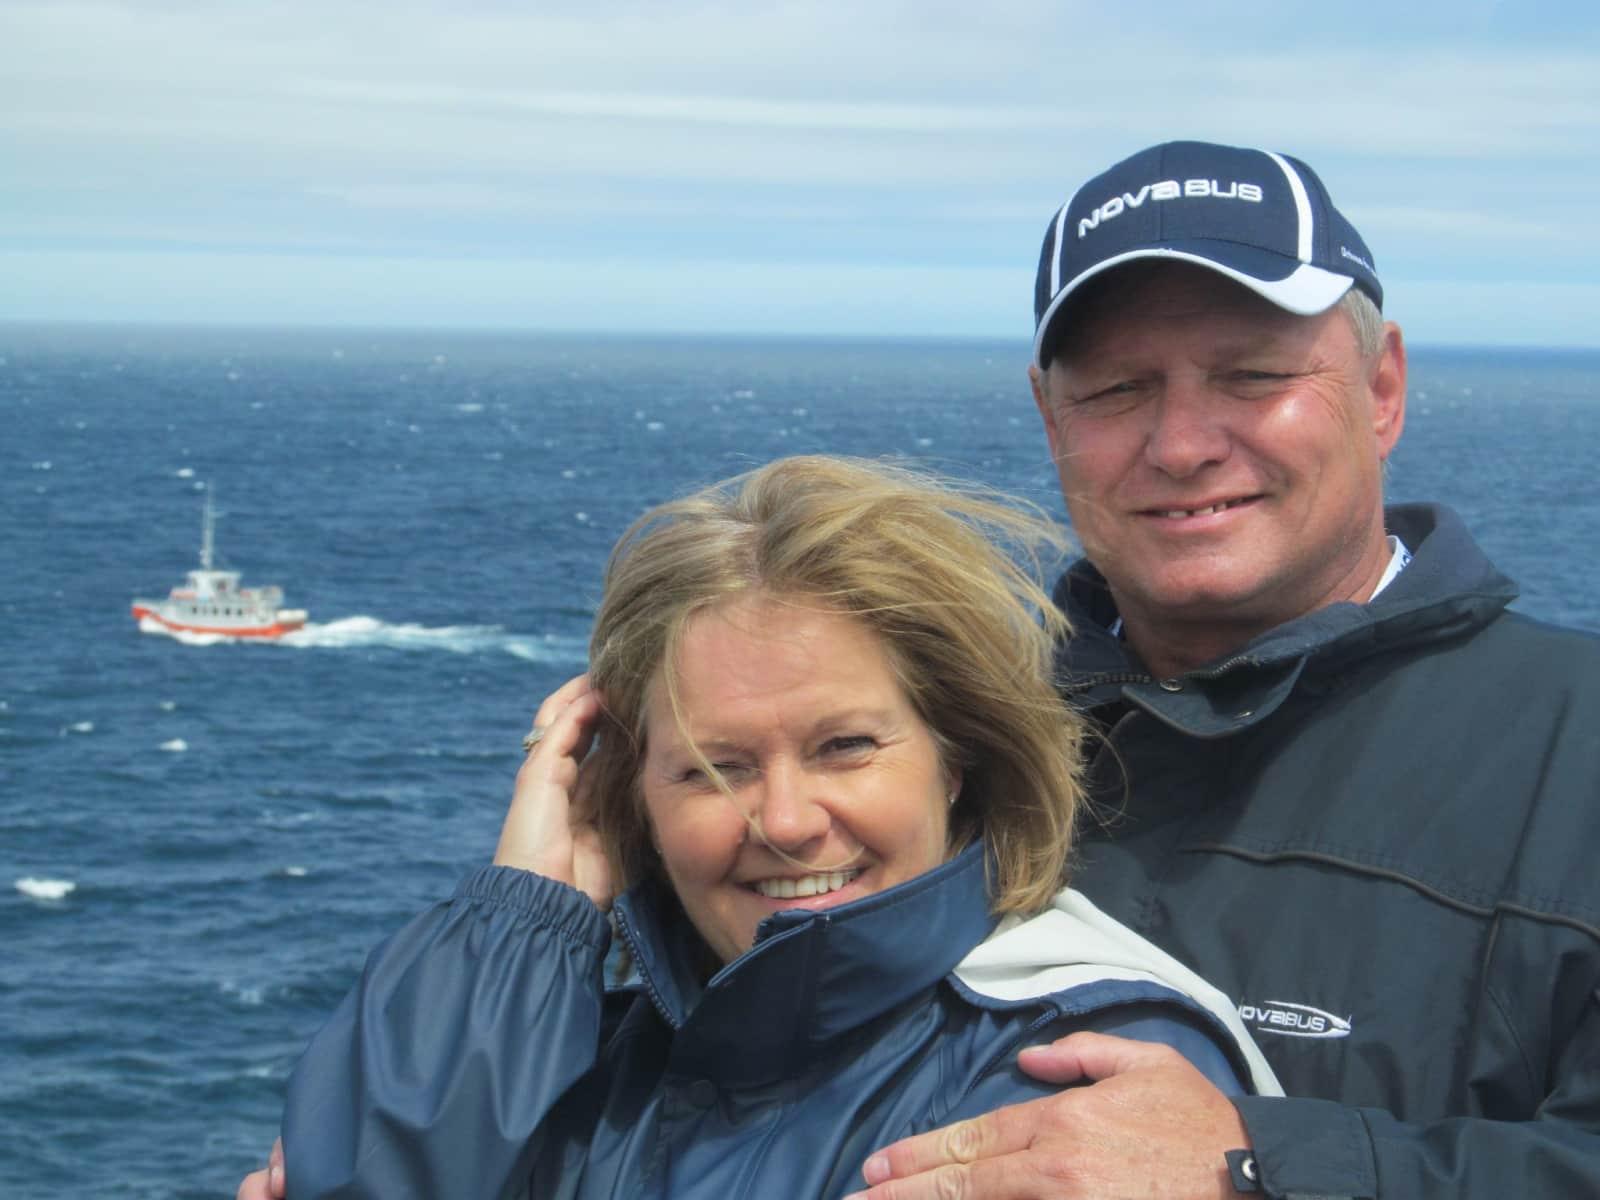 Ruth & Wayne from Welland, Ontario, Canada